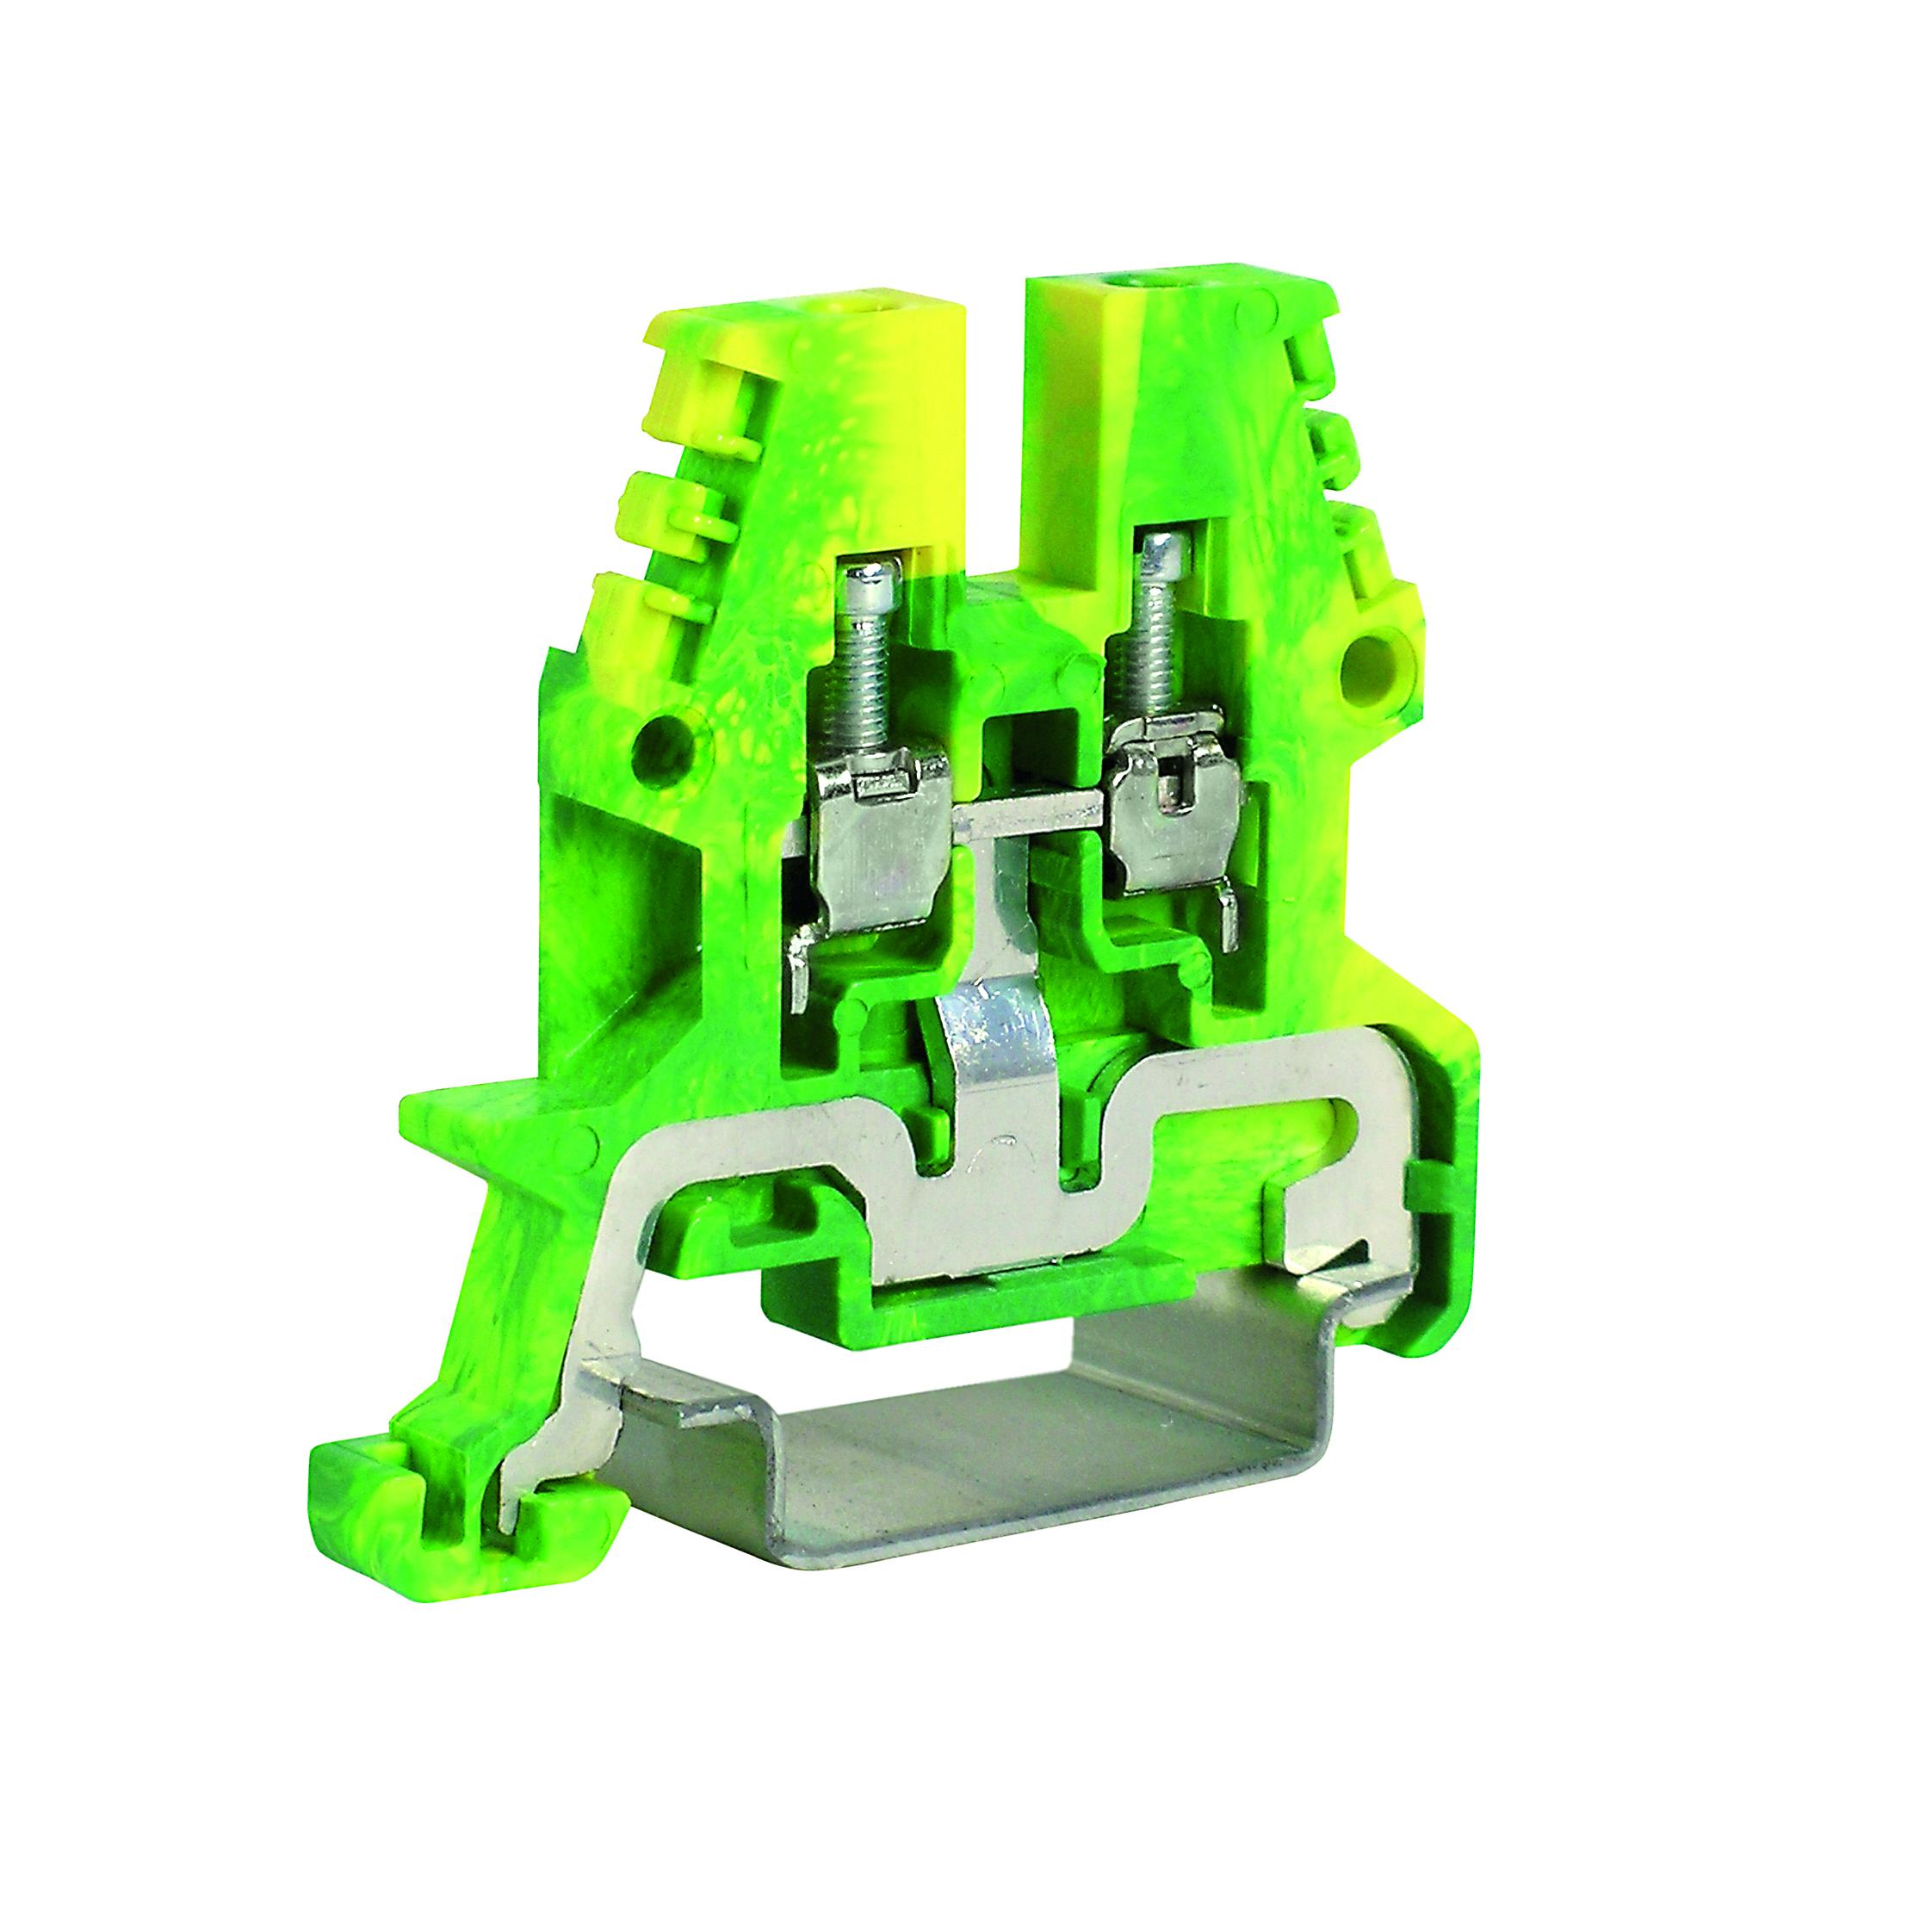 1 Stk Erdungsklemme TEO.2 grün-gelb, 2,5mm² IK122002--